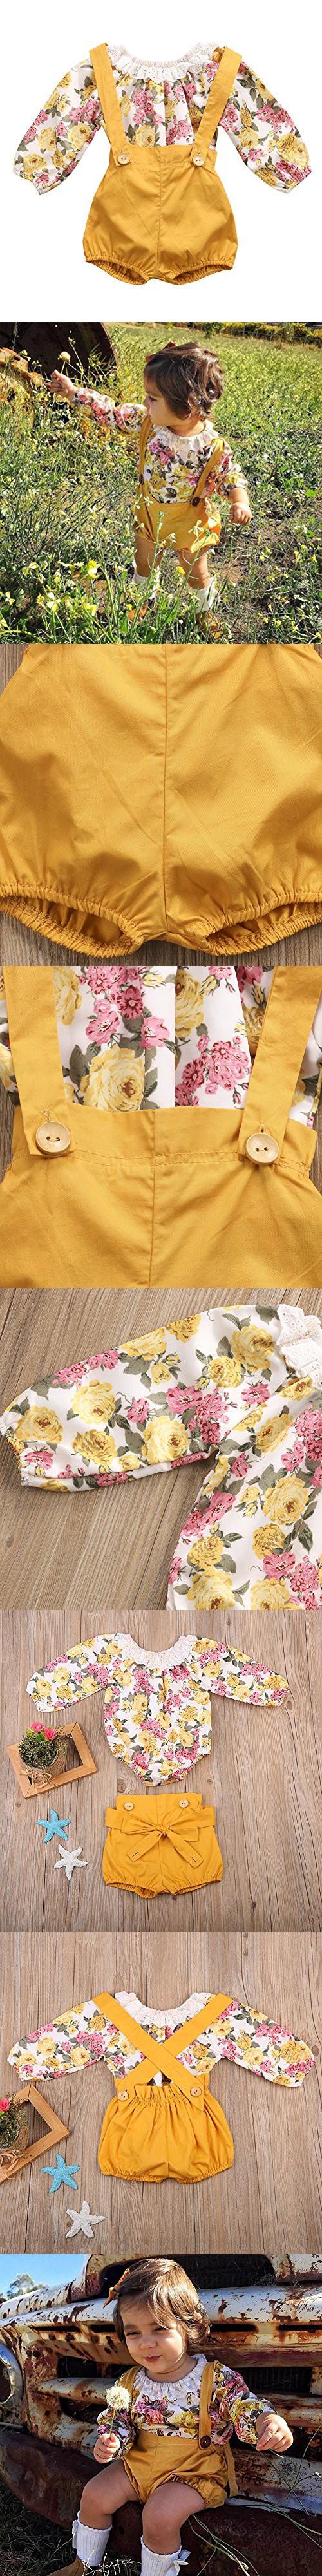 a4e261ccf7d1 GRNSHTS Baby Girls Floral Suspenders Pant Set Long Sleeve Romper + Short  Overalls (90